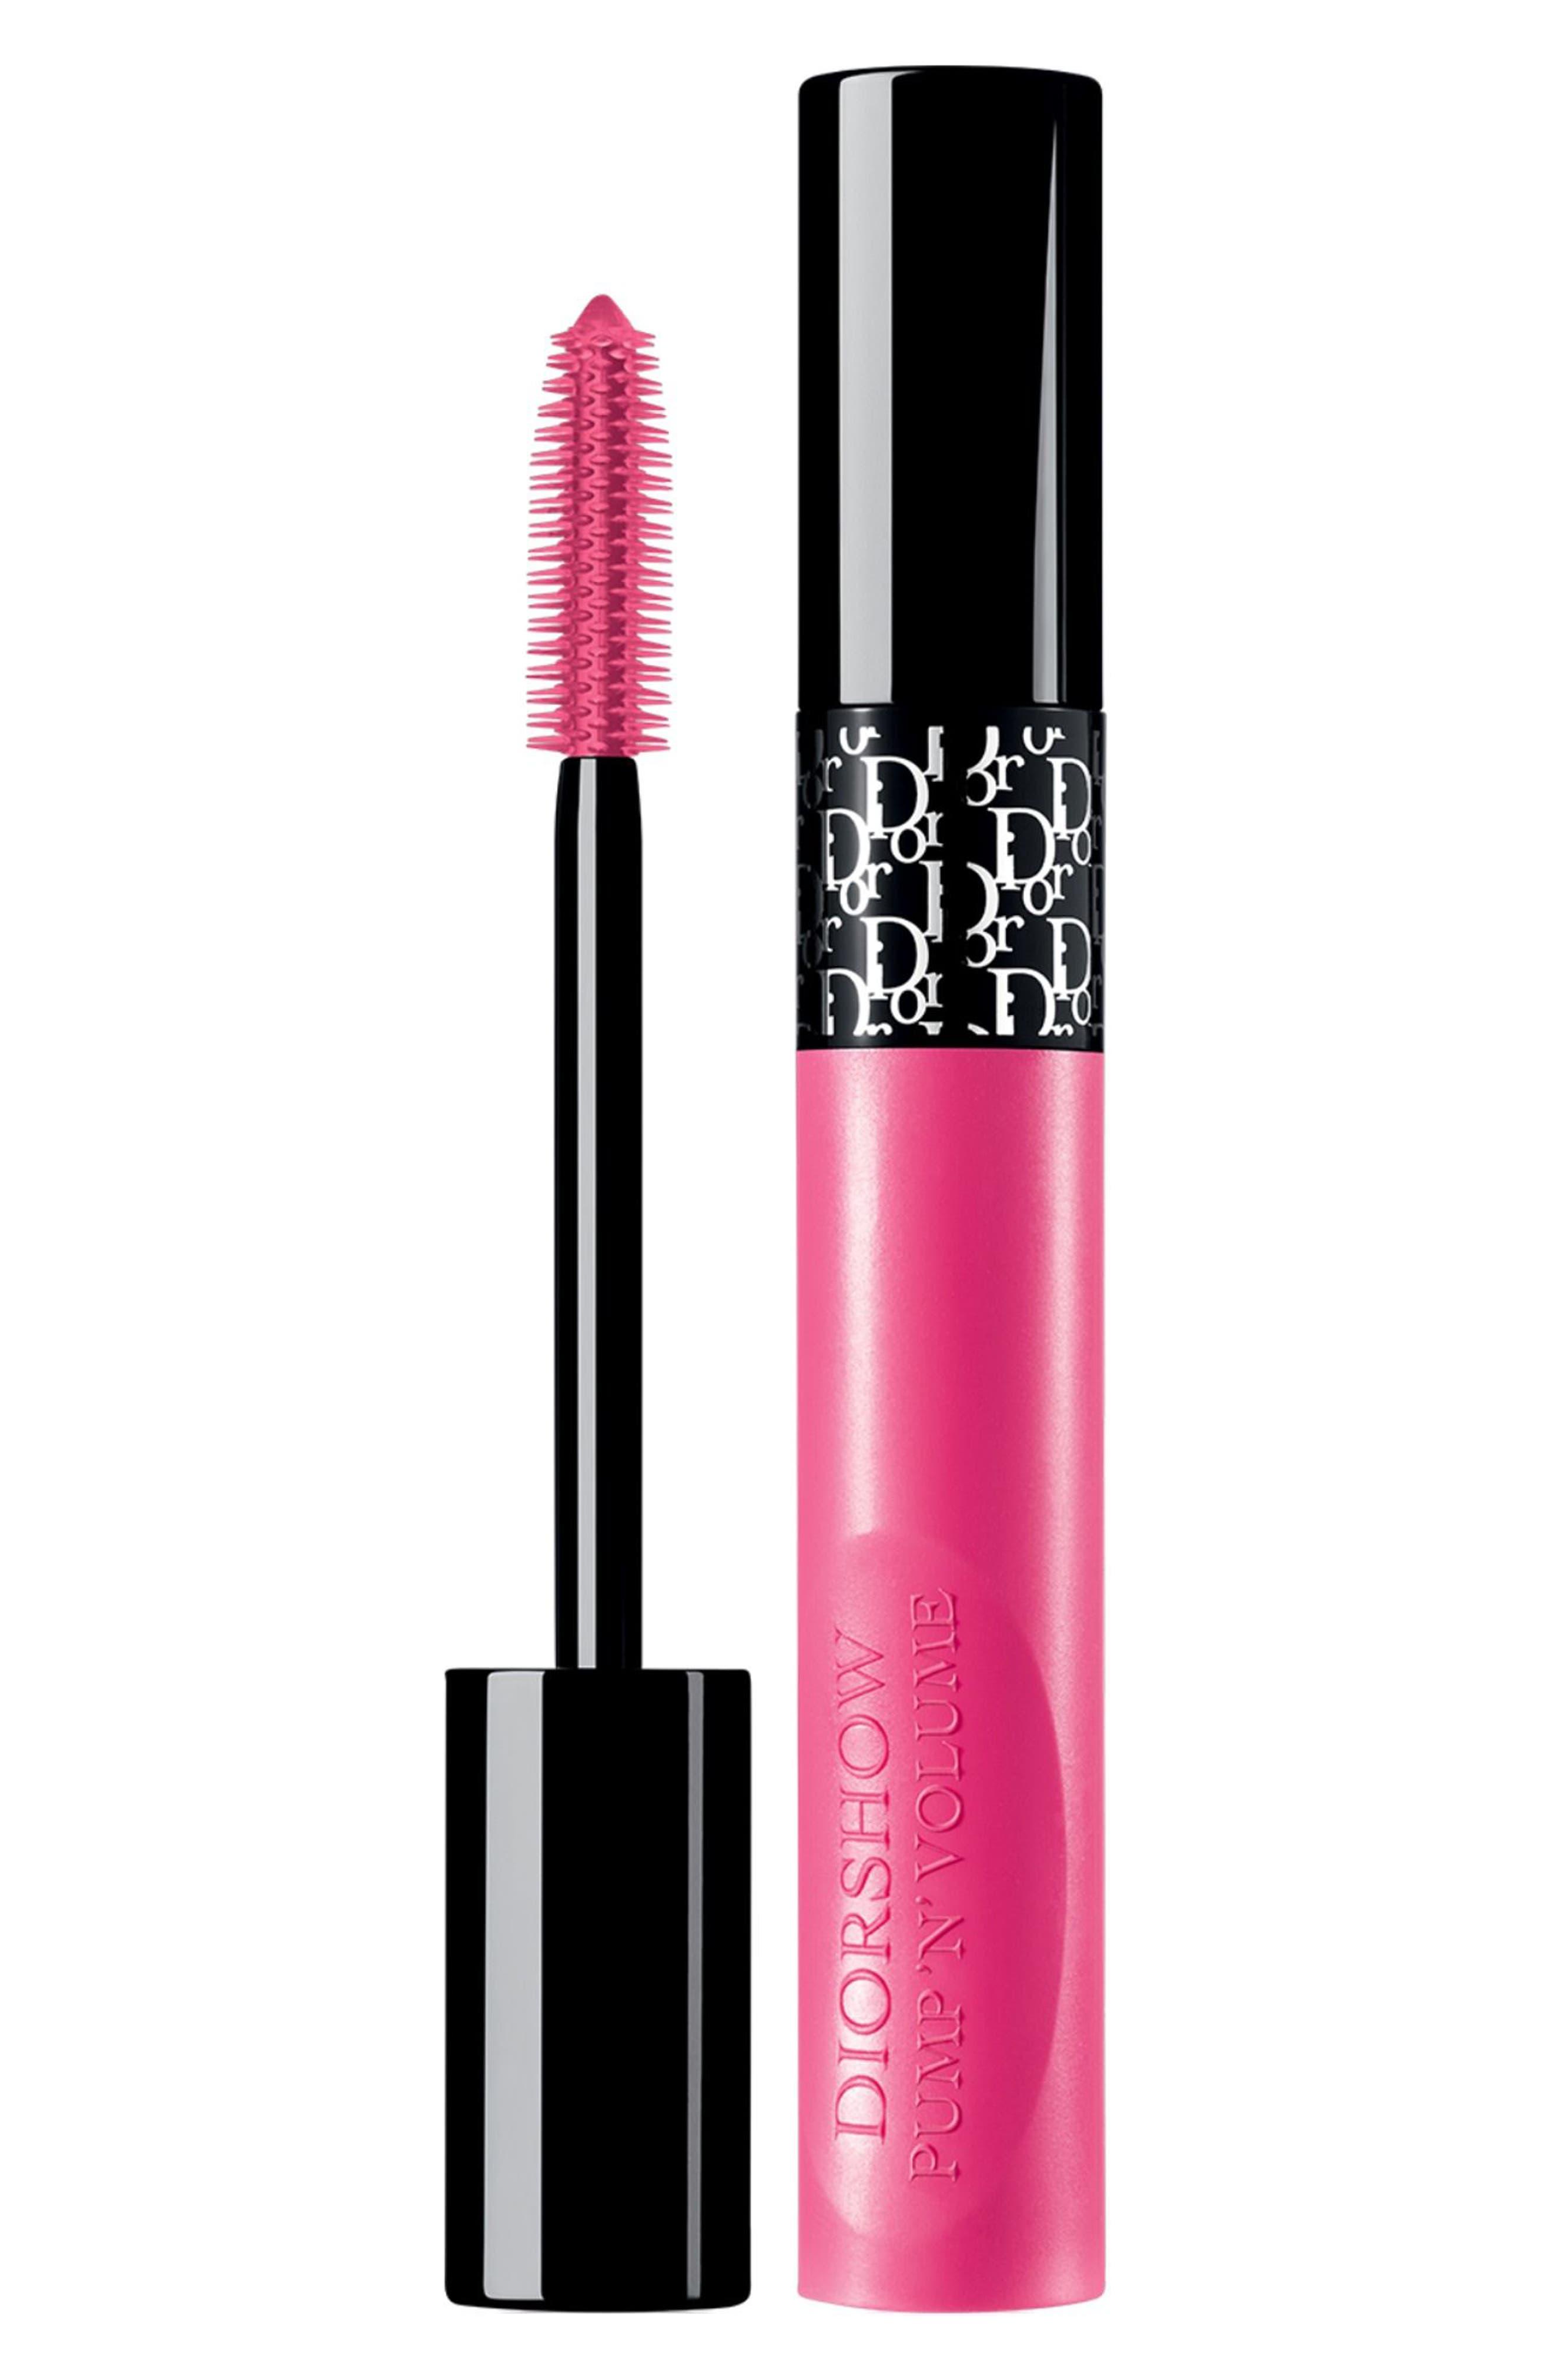 Dior Diorshow Pump N Volume Mascara - 840 Pink Pump